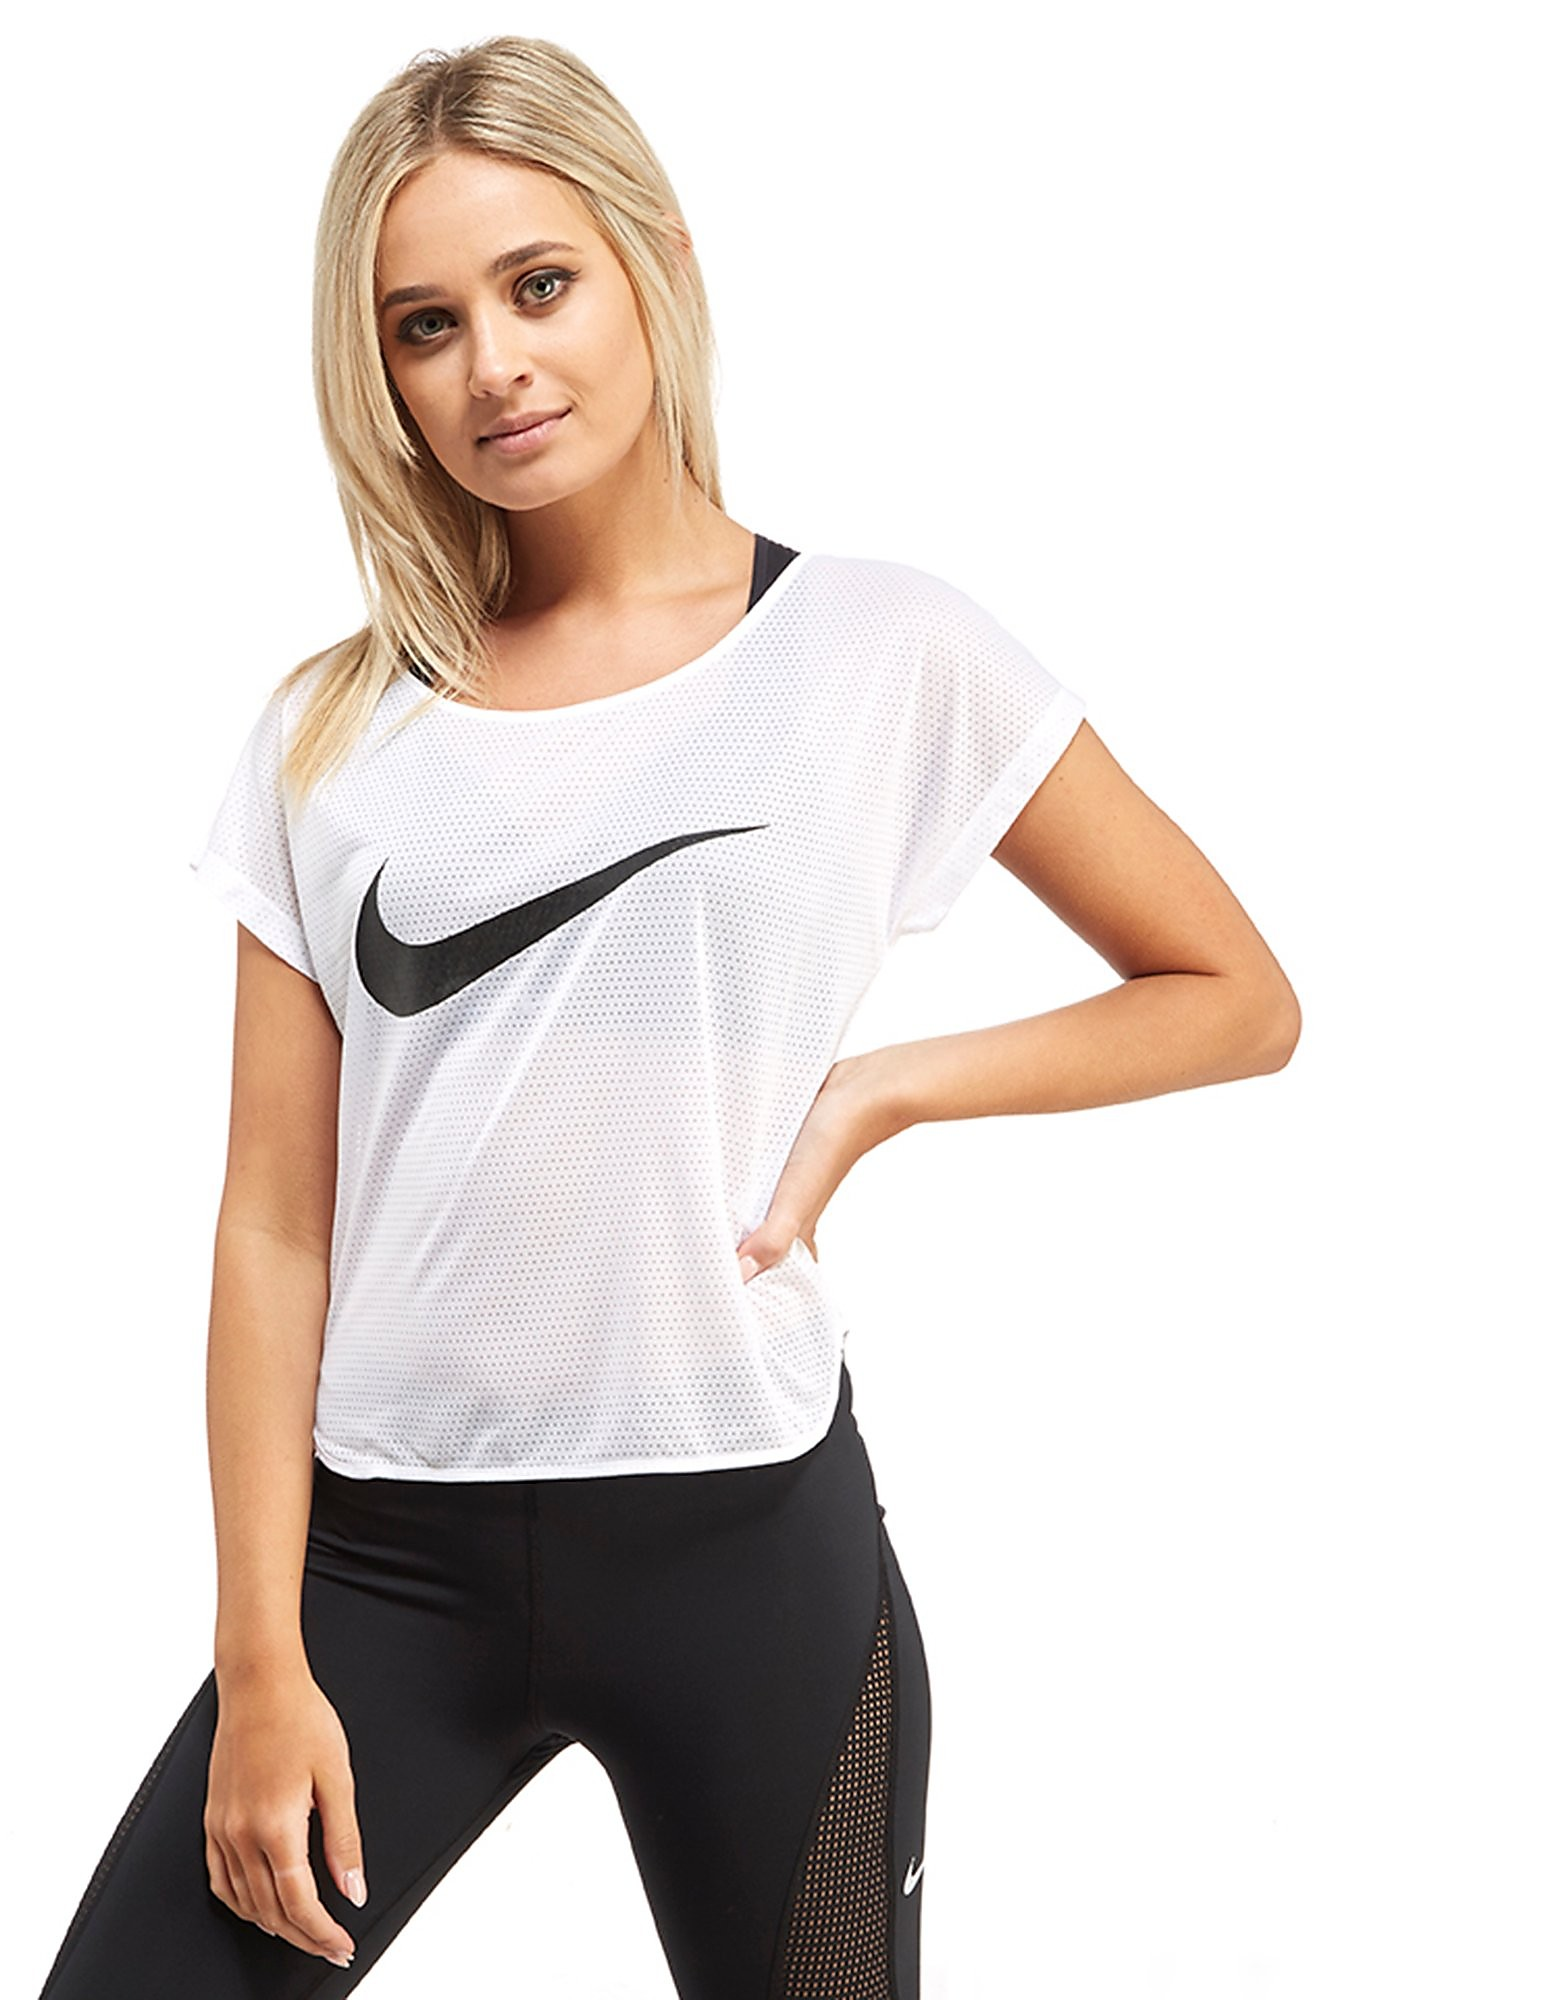 Nike Camiseta City con símbolo de Nike